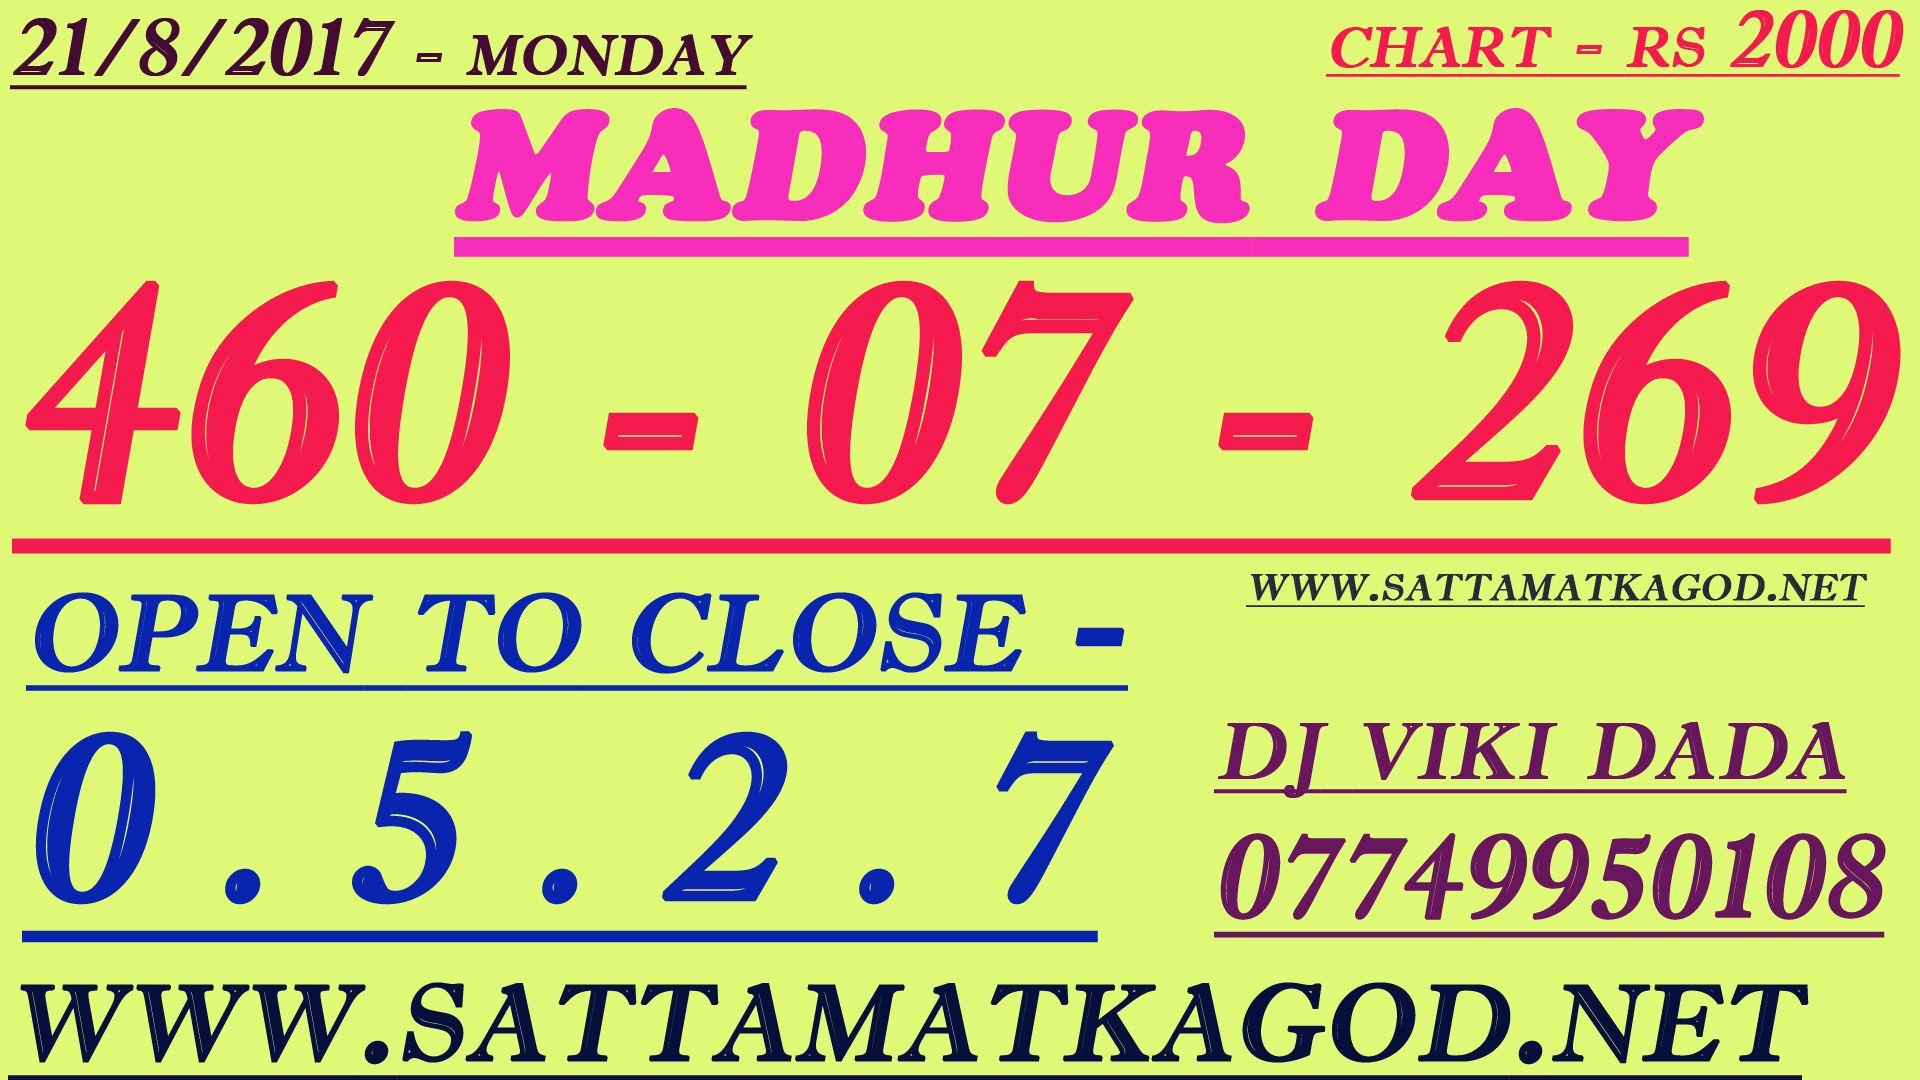 21/8/2017 - MADHUR DAY MATKA BAZAR FREE MATKA JODI TIPS